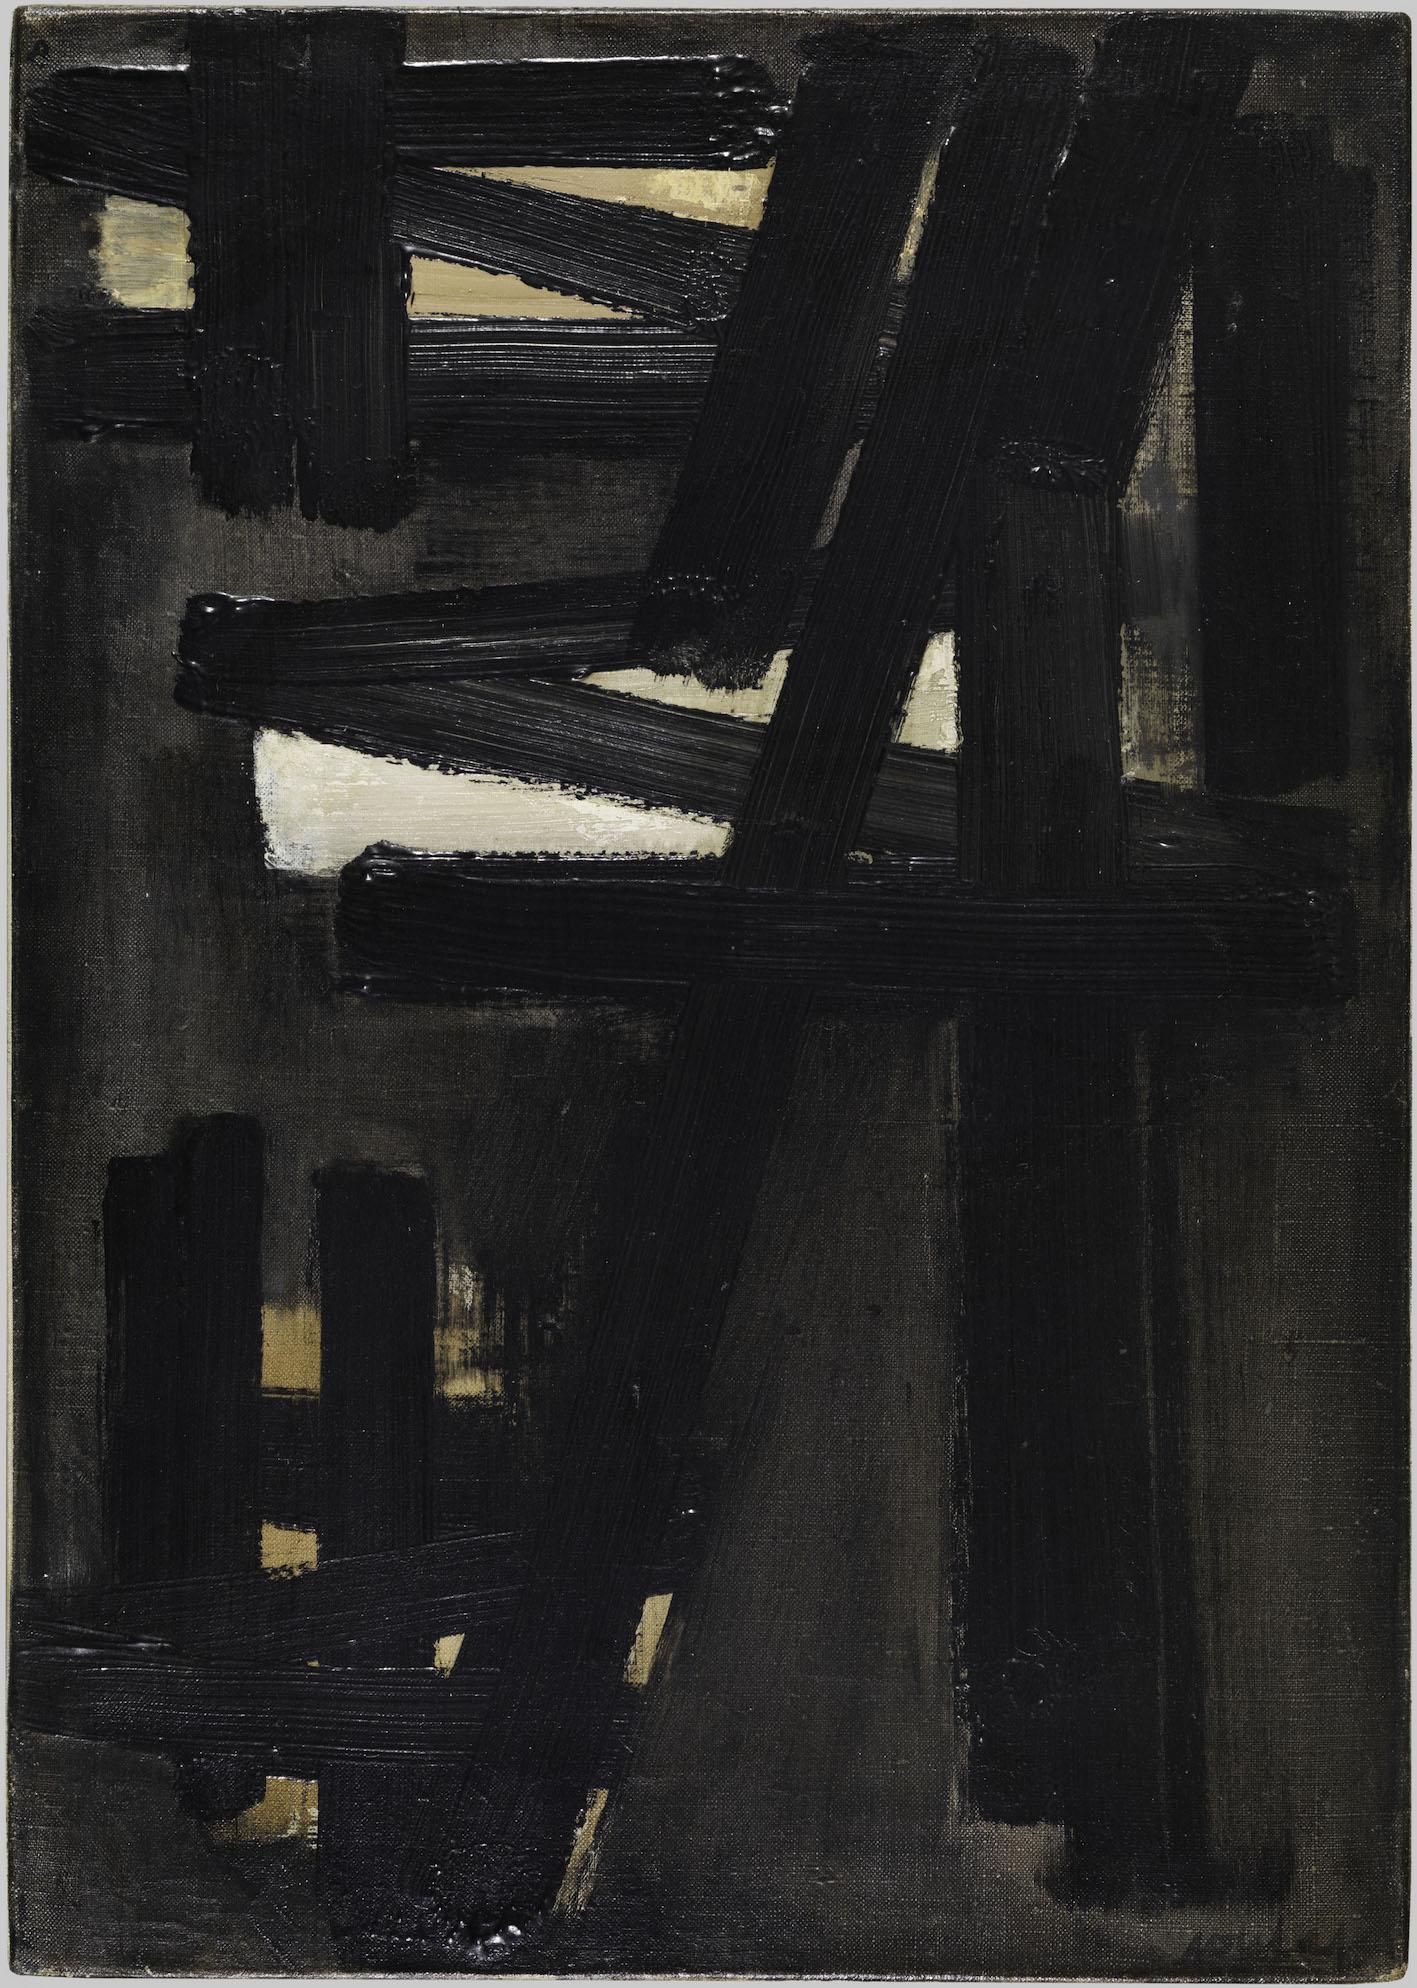 Peinture 46 x 33, 16 juin 1953 Photo ©Centre Pompidou, MNAM-CCI, Dist. RMN-Grand Palais _Philippe Migeat © ADAGP, Paris.jpg